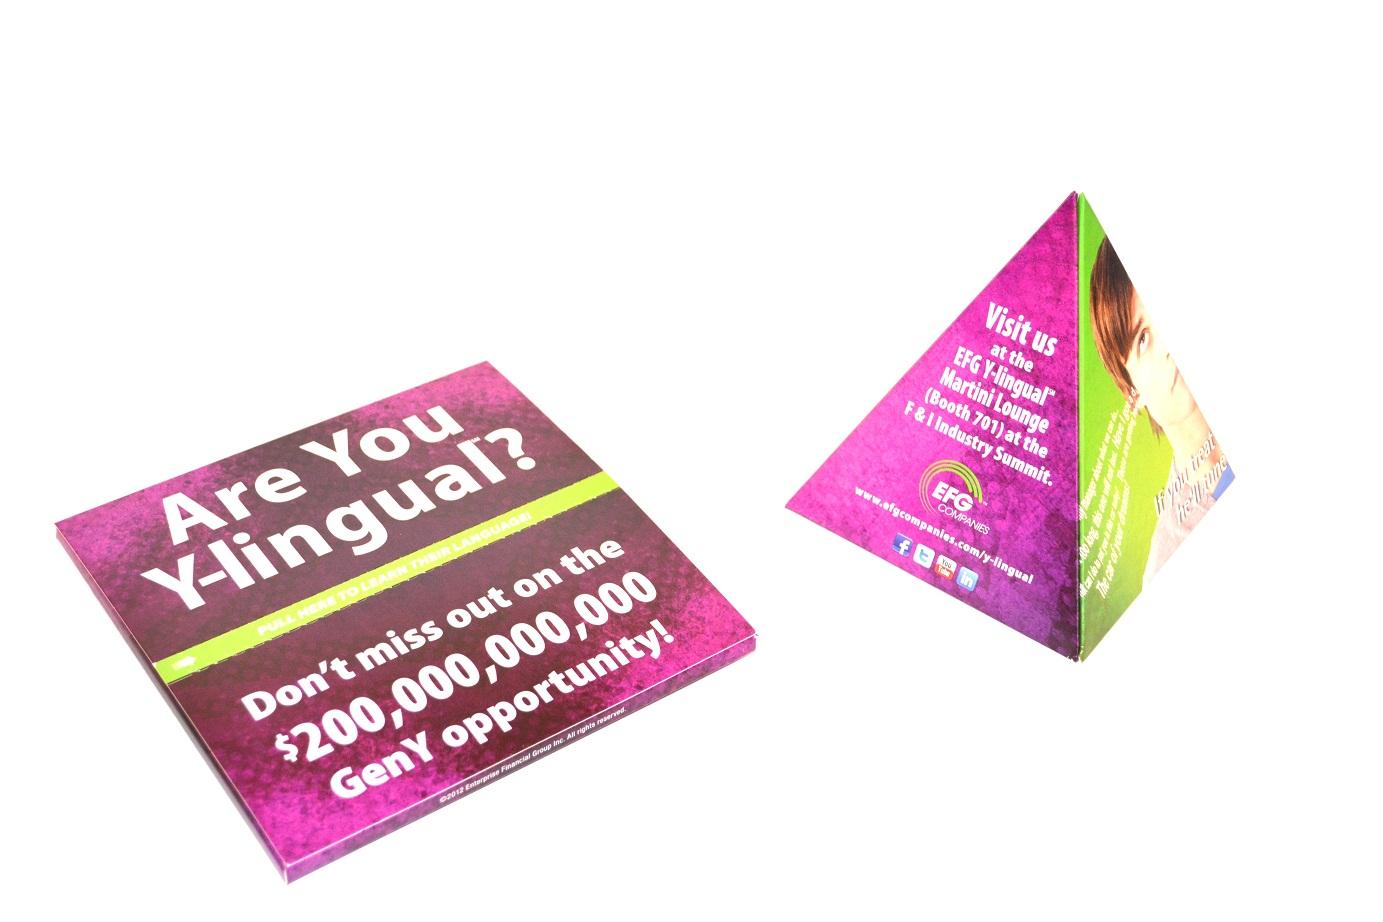 pop-up pyramid mailer